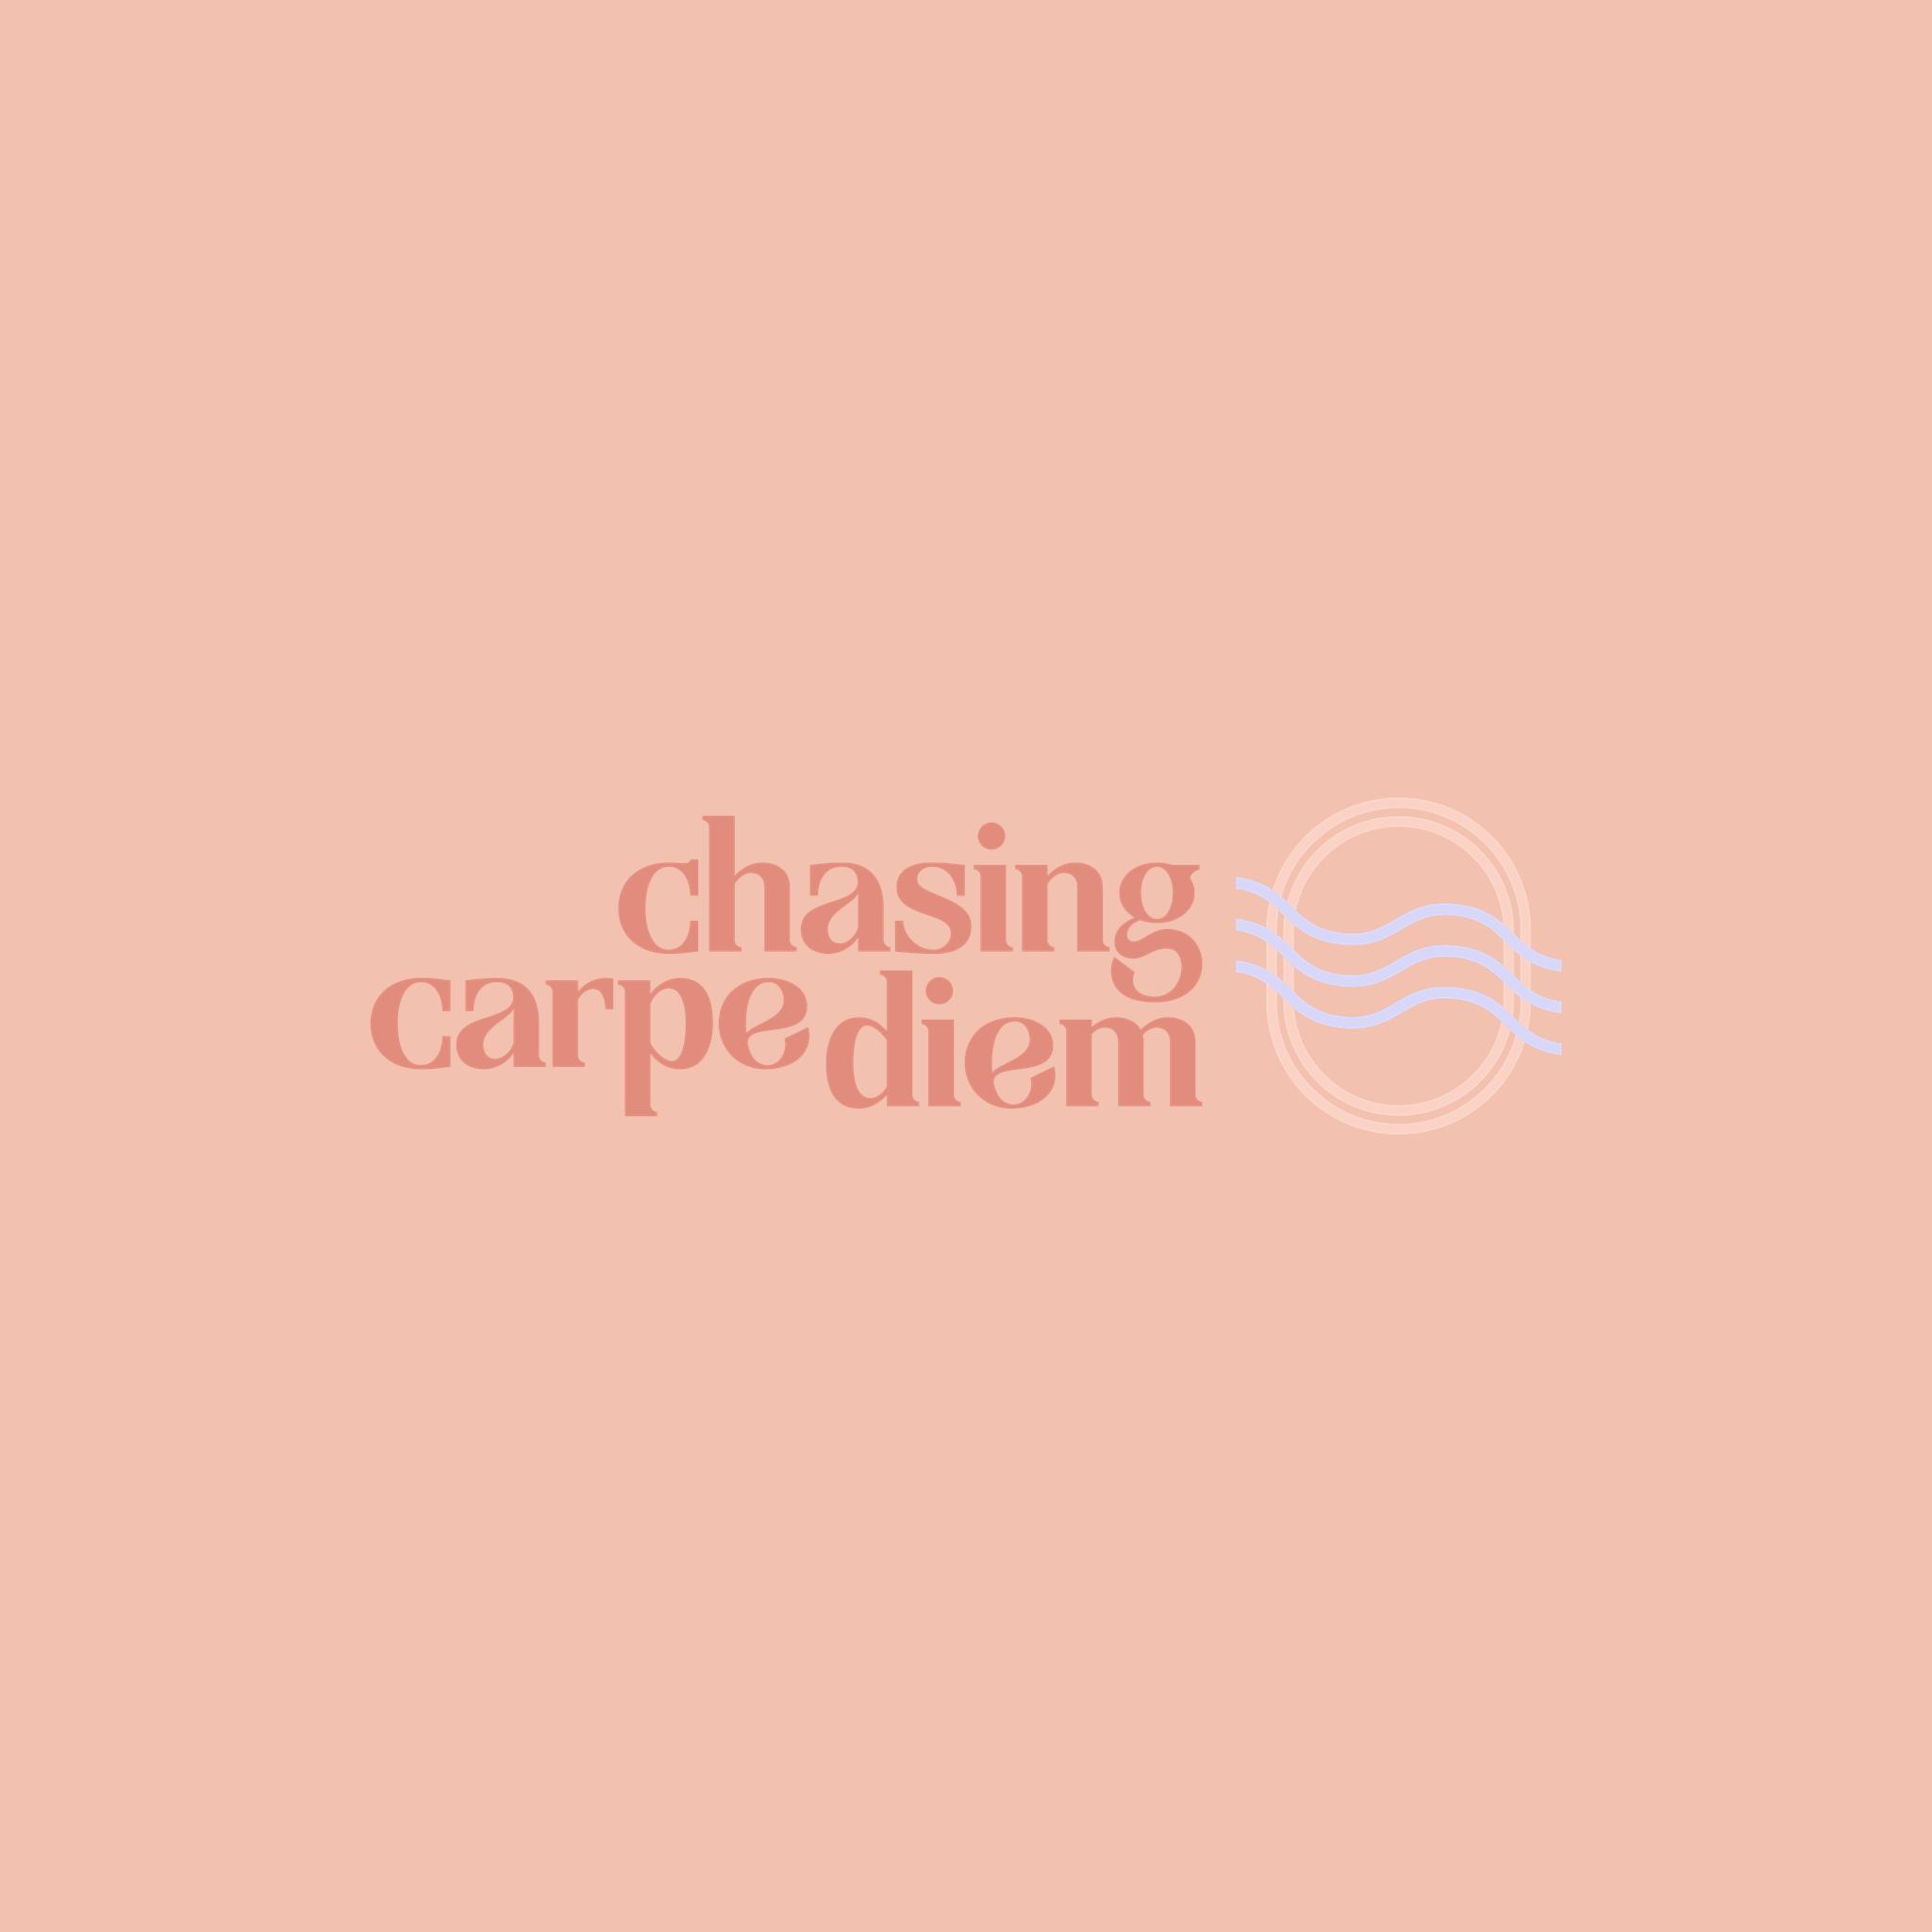 #chasingcarpediem #LOGO #travellogo #bloggerlogo #bloglogo